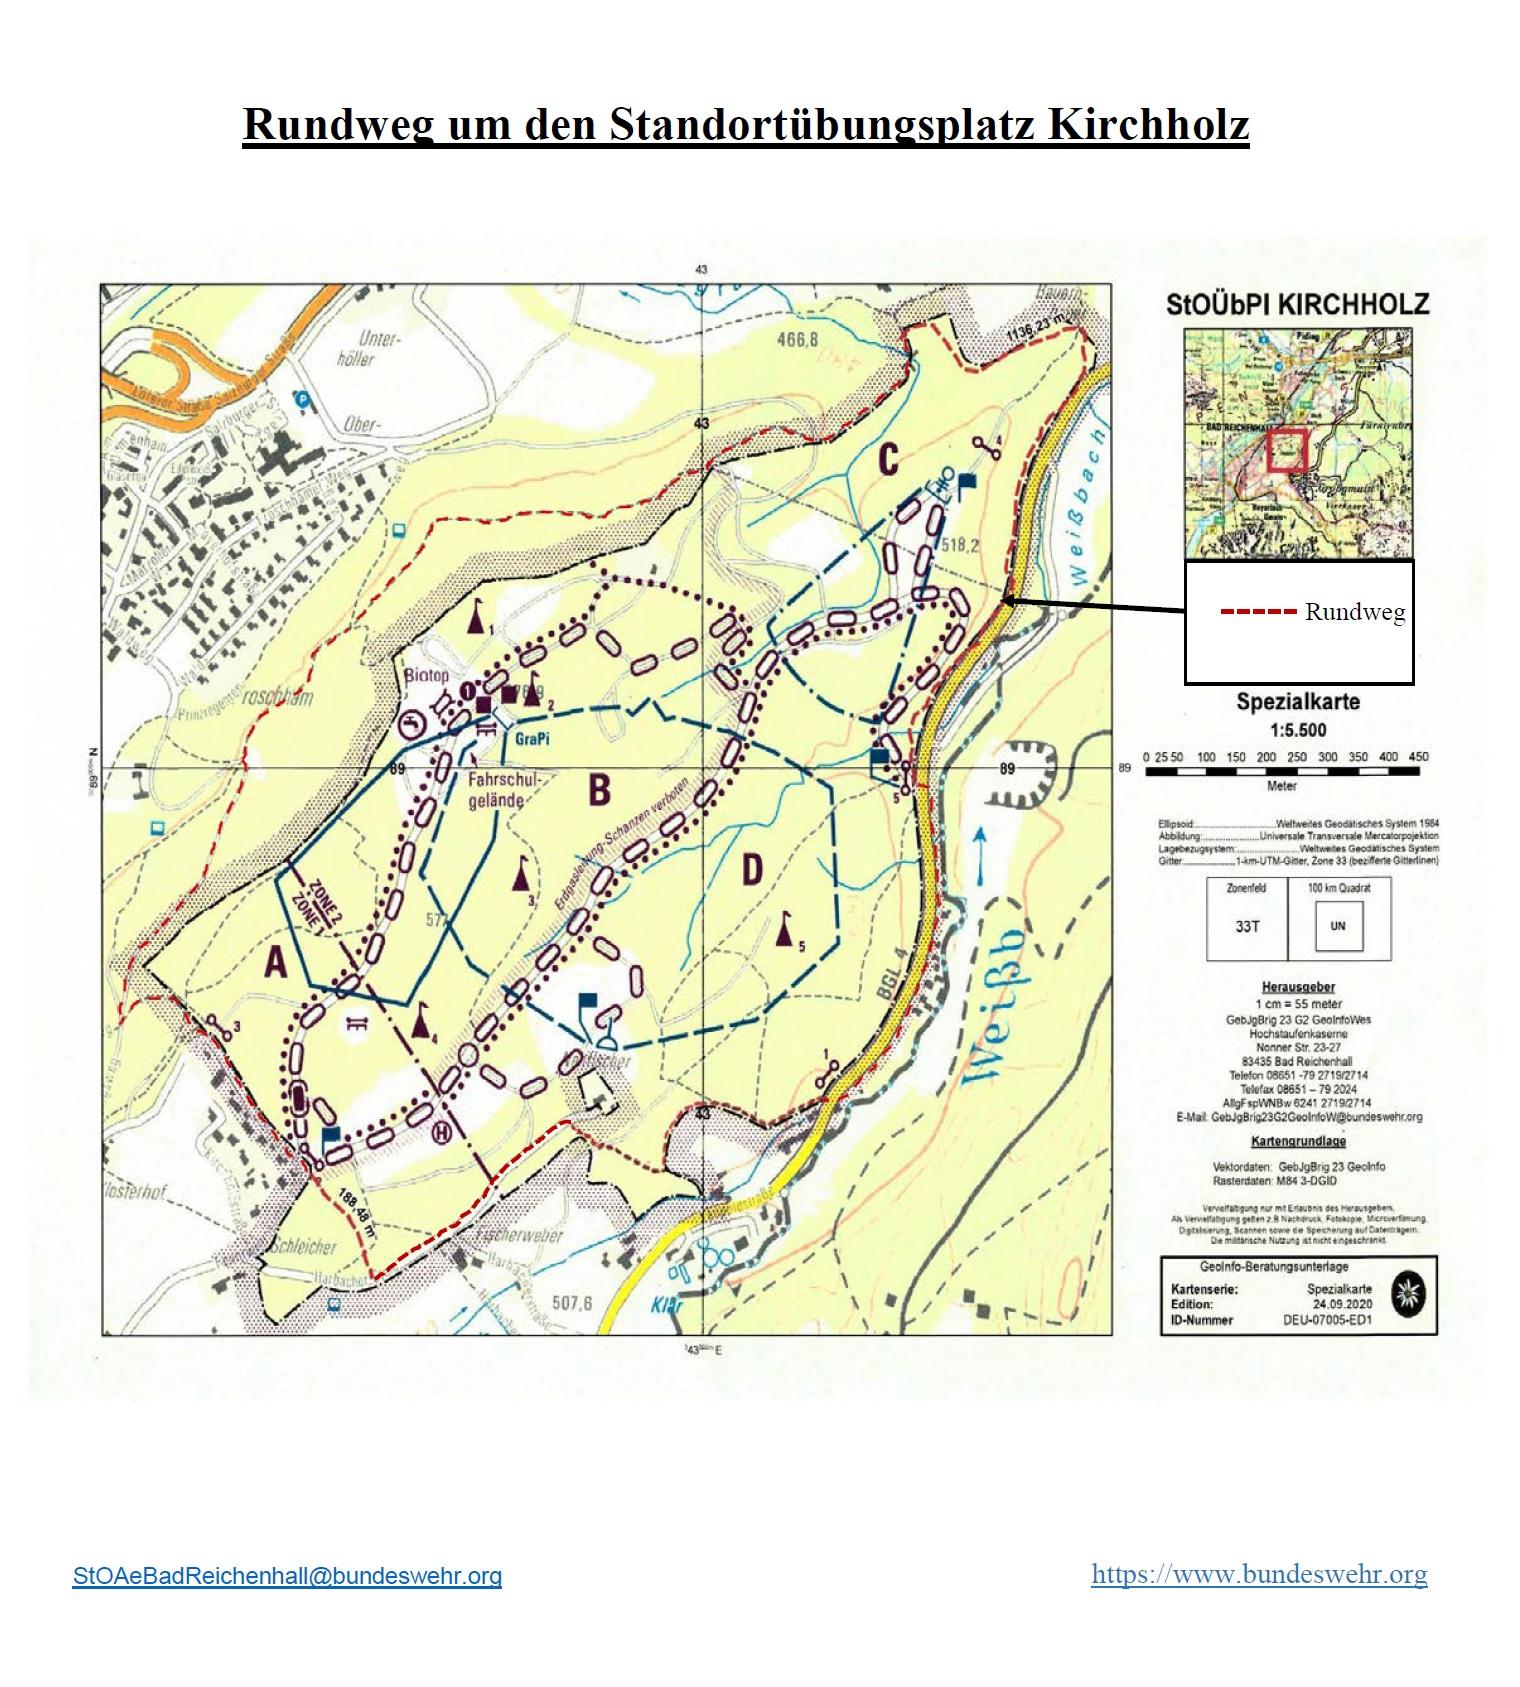 Rundweg Standortübungsplatz Kirchholz